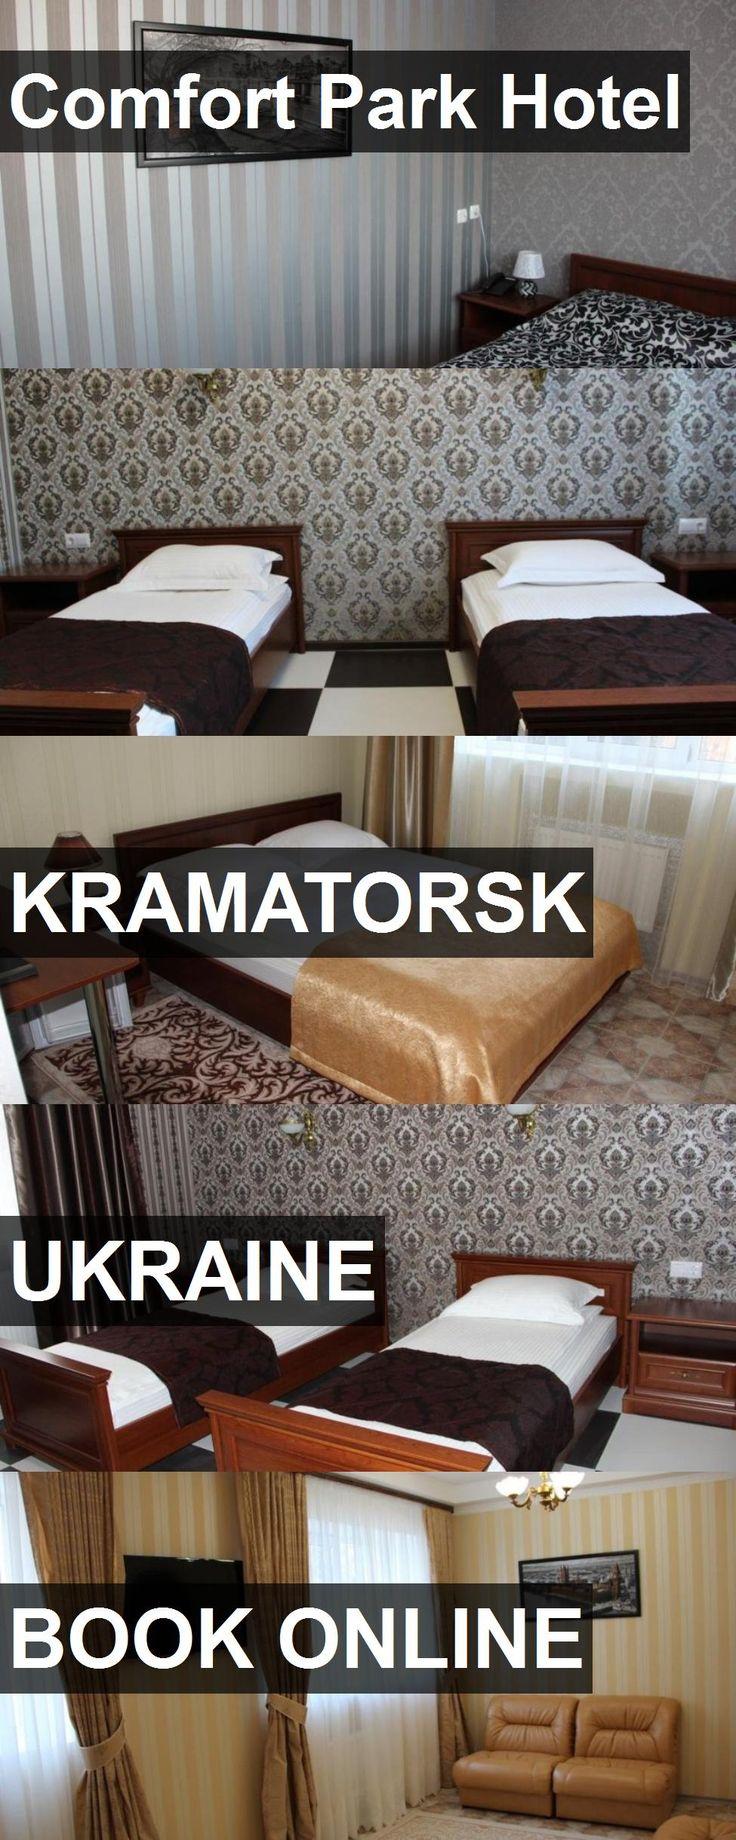 Hotel Comfort Park Hotel in Kramatorsk, Ukraine. For more information, photos, reviews and best prices please follow the link. #Ukraine #Kramatorsk #ComfortParkHotel #hotel #travel #vacation